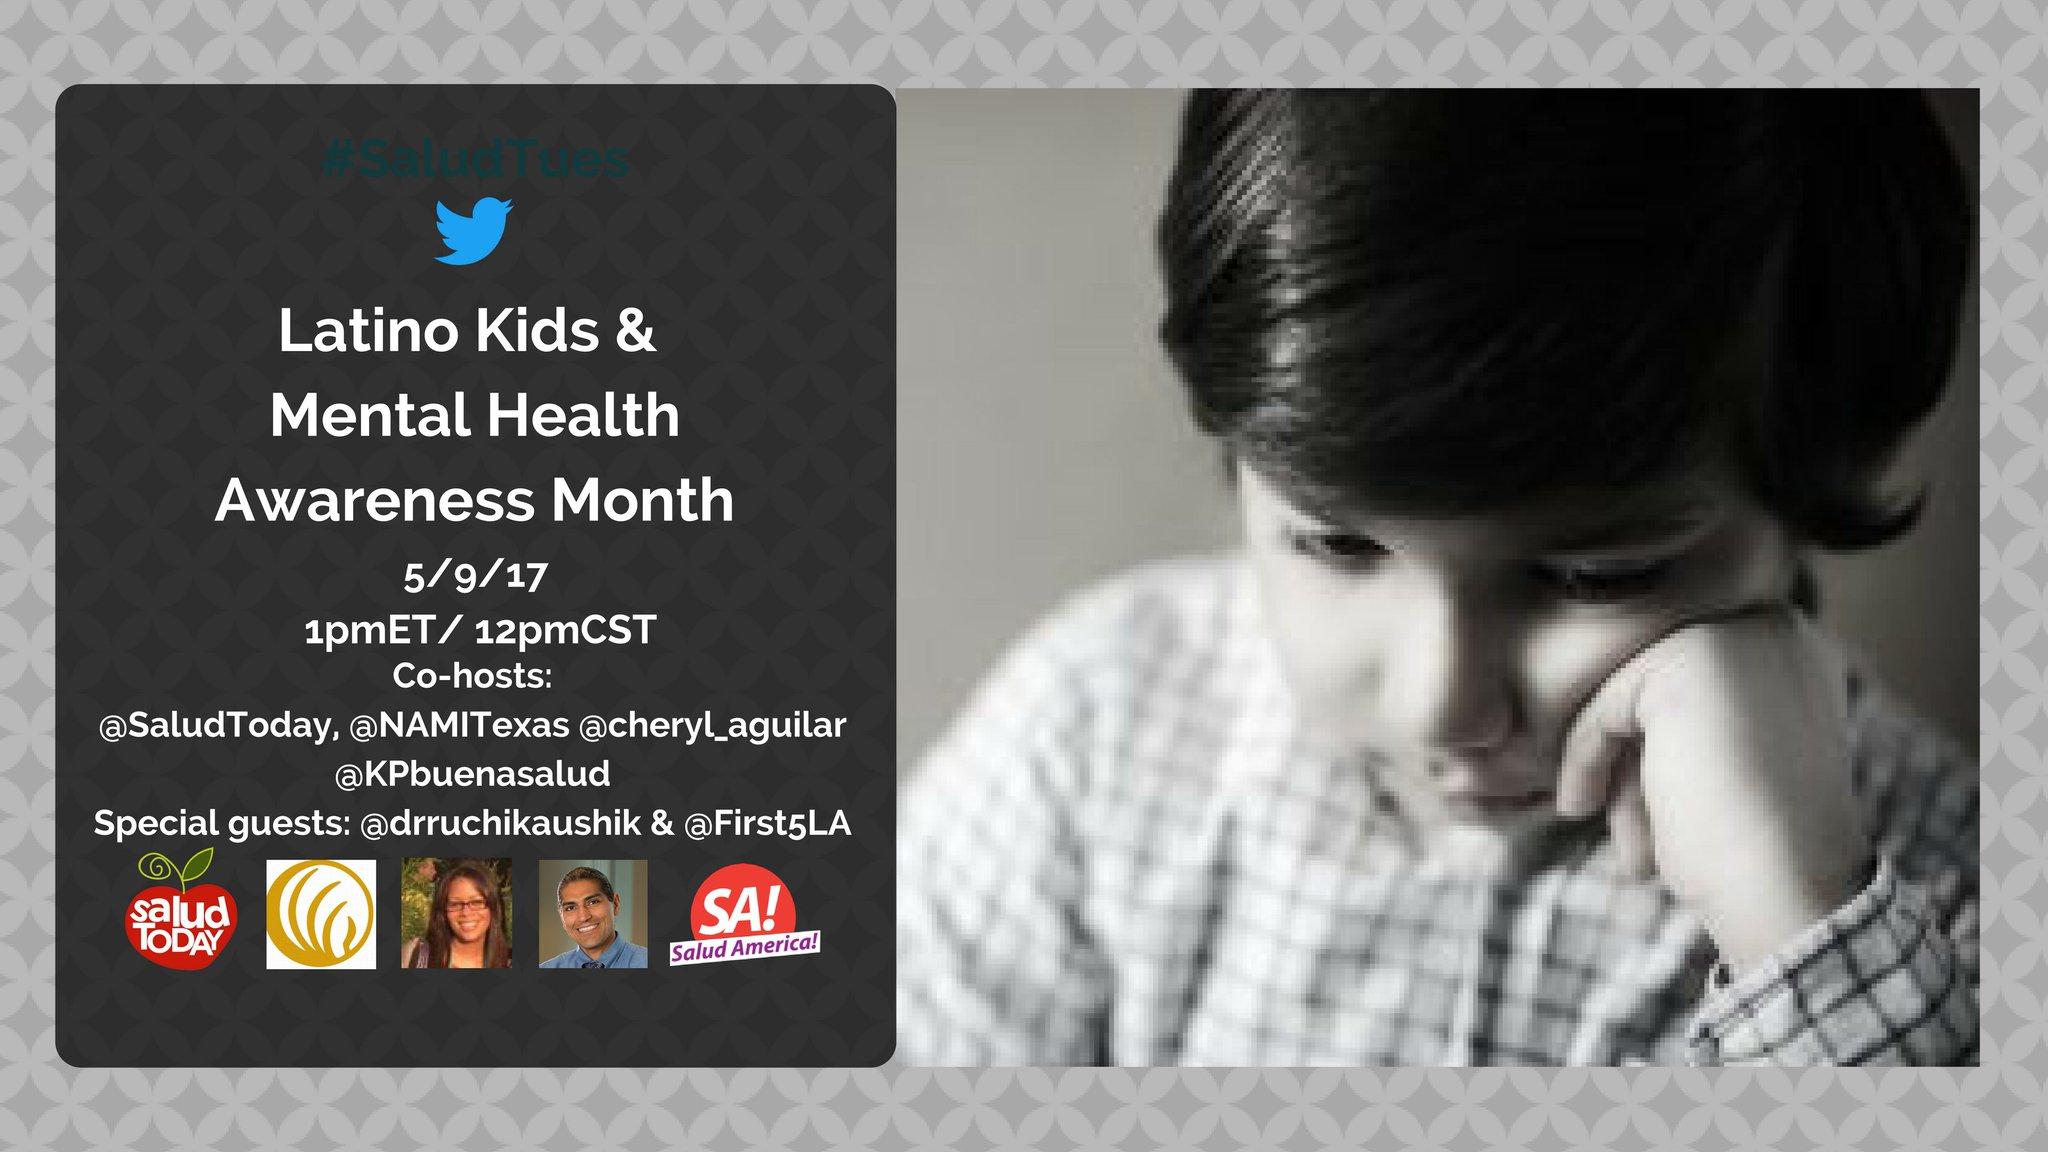 Thumbnail for #SaludTues Latino Kids & Mental Health Awareness Month